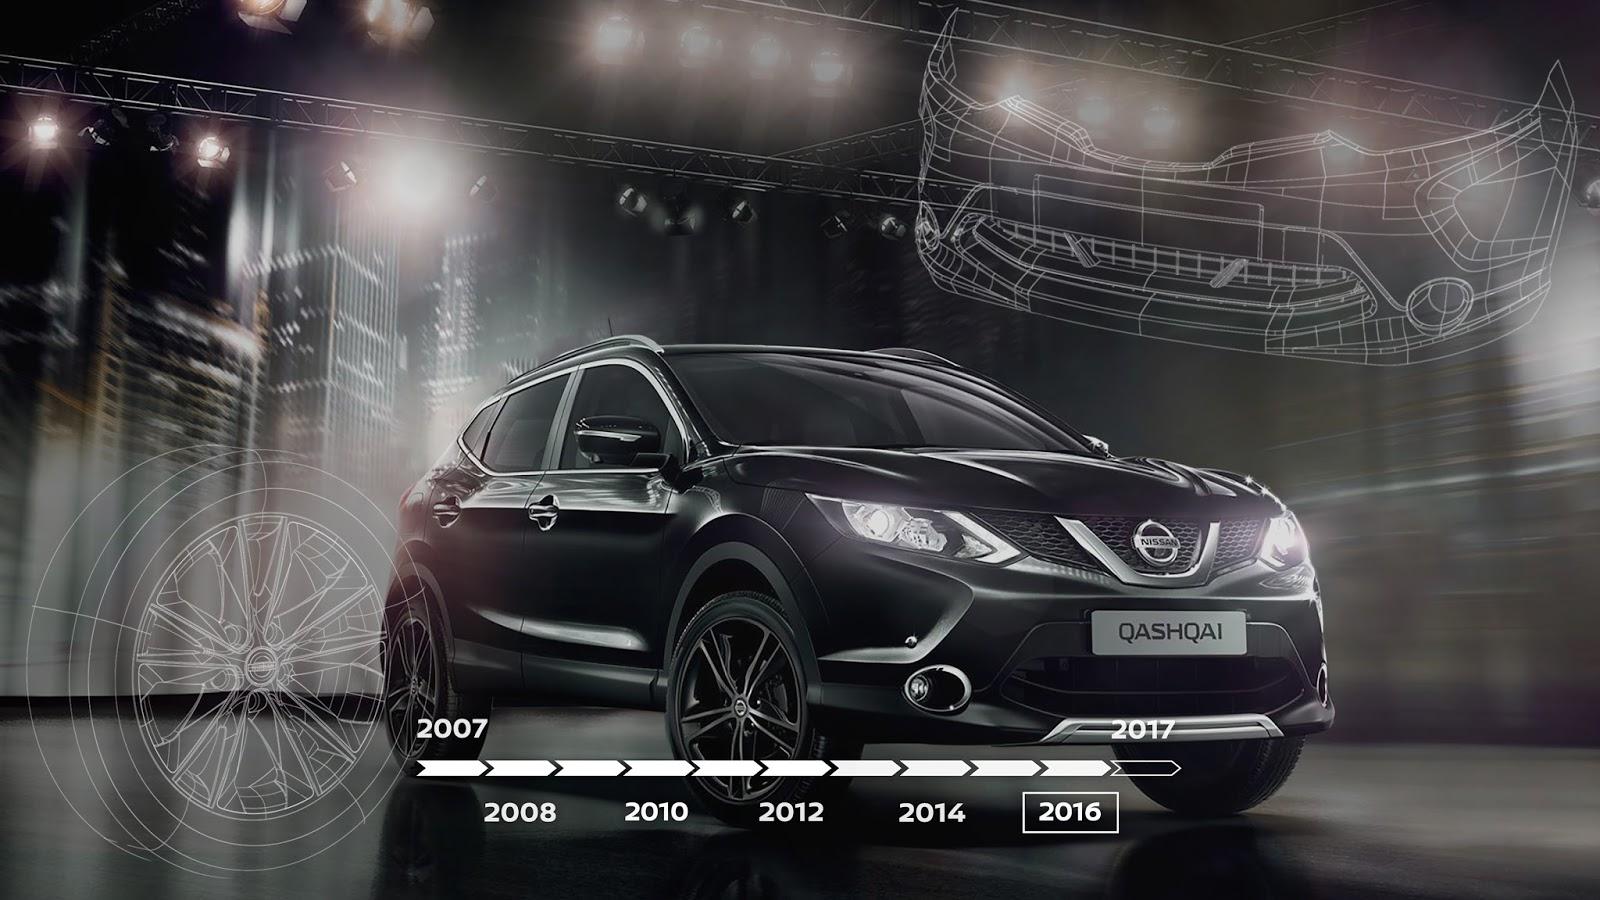 Nissan QASHQAI : το Αυθεντικό Crossover γιορτάζει 10 χρόνια με ένα συναρπαστικό video